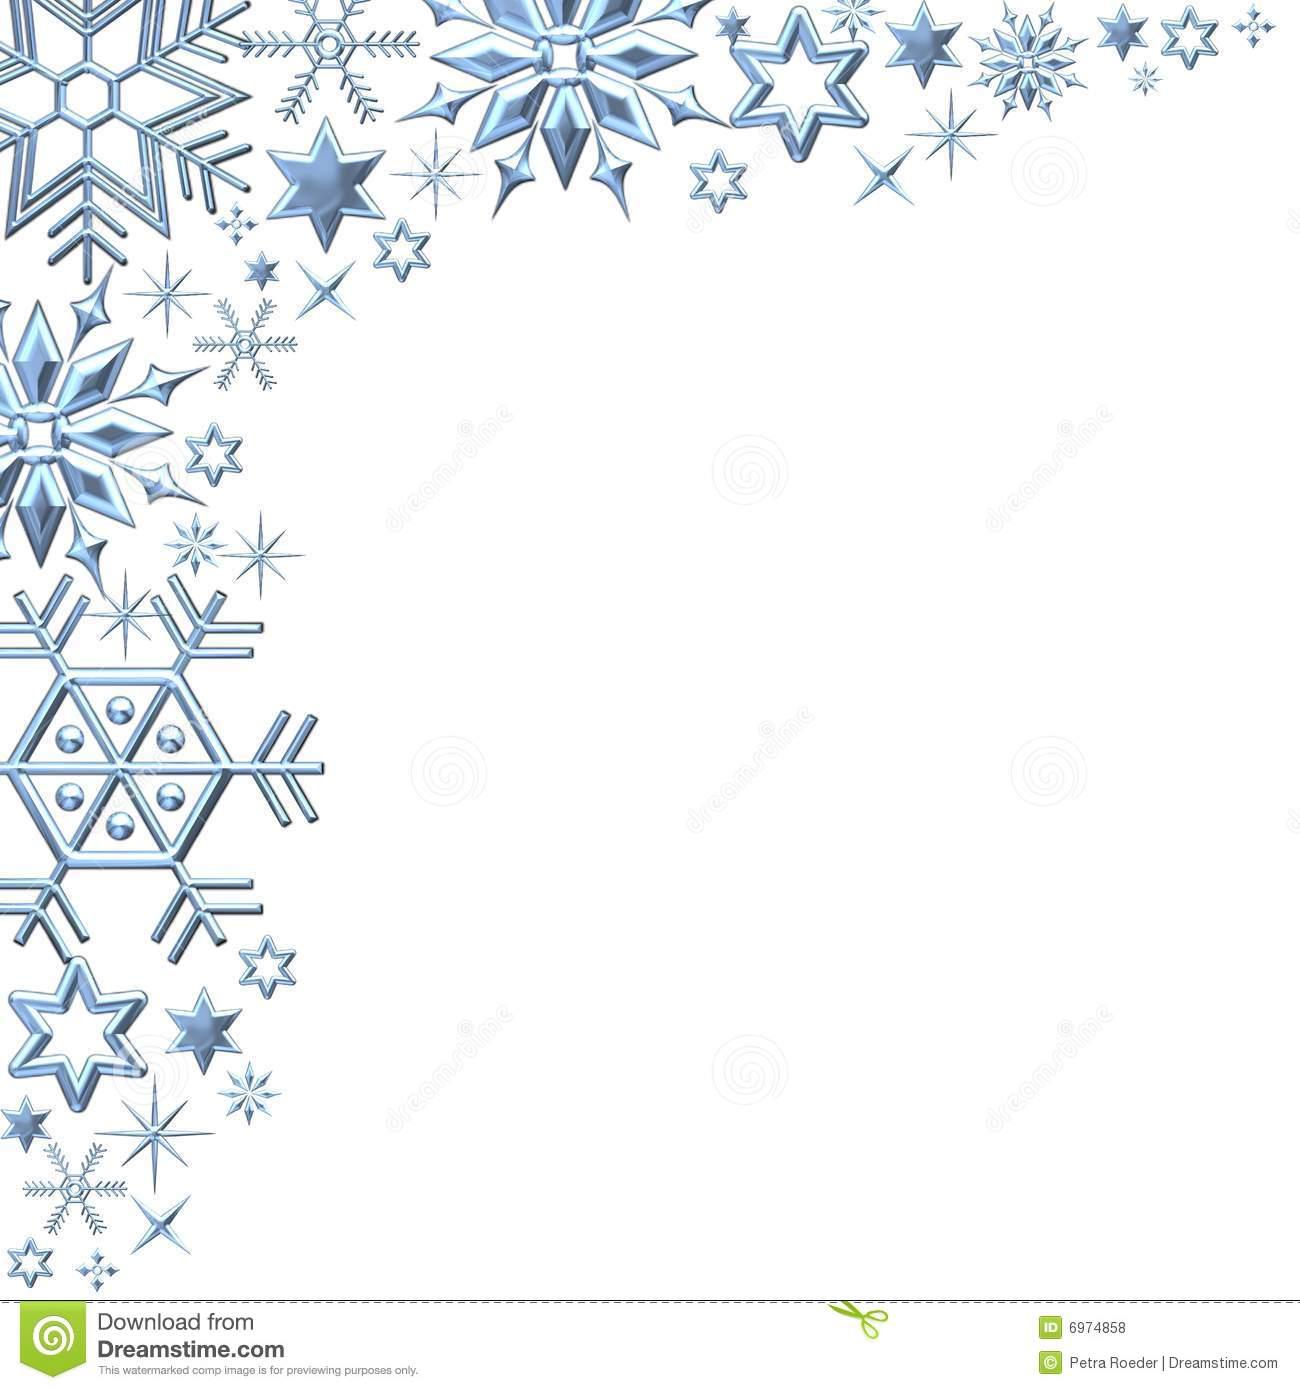 Winter Snowflakes Clip Art ..